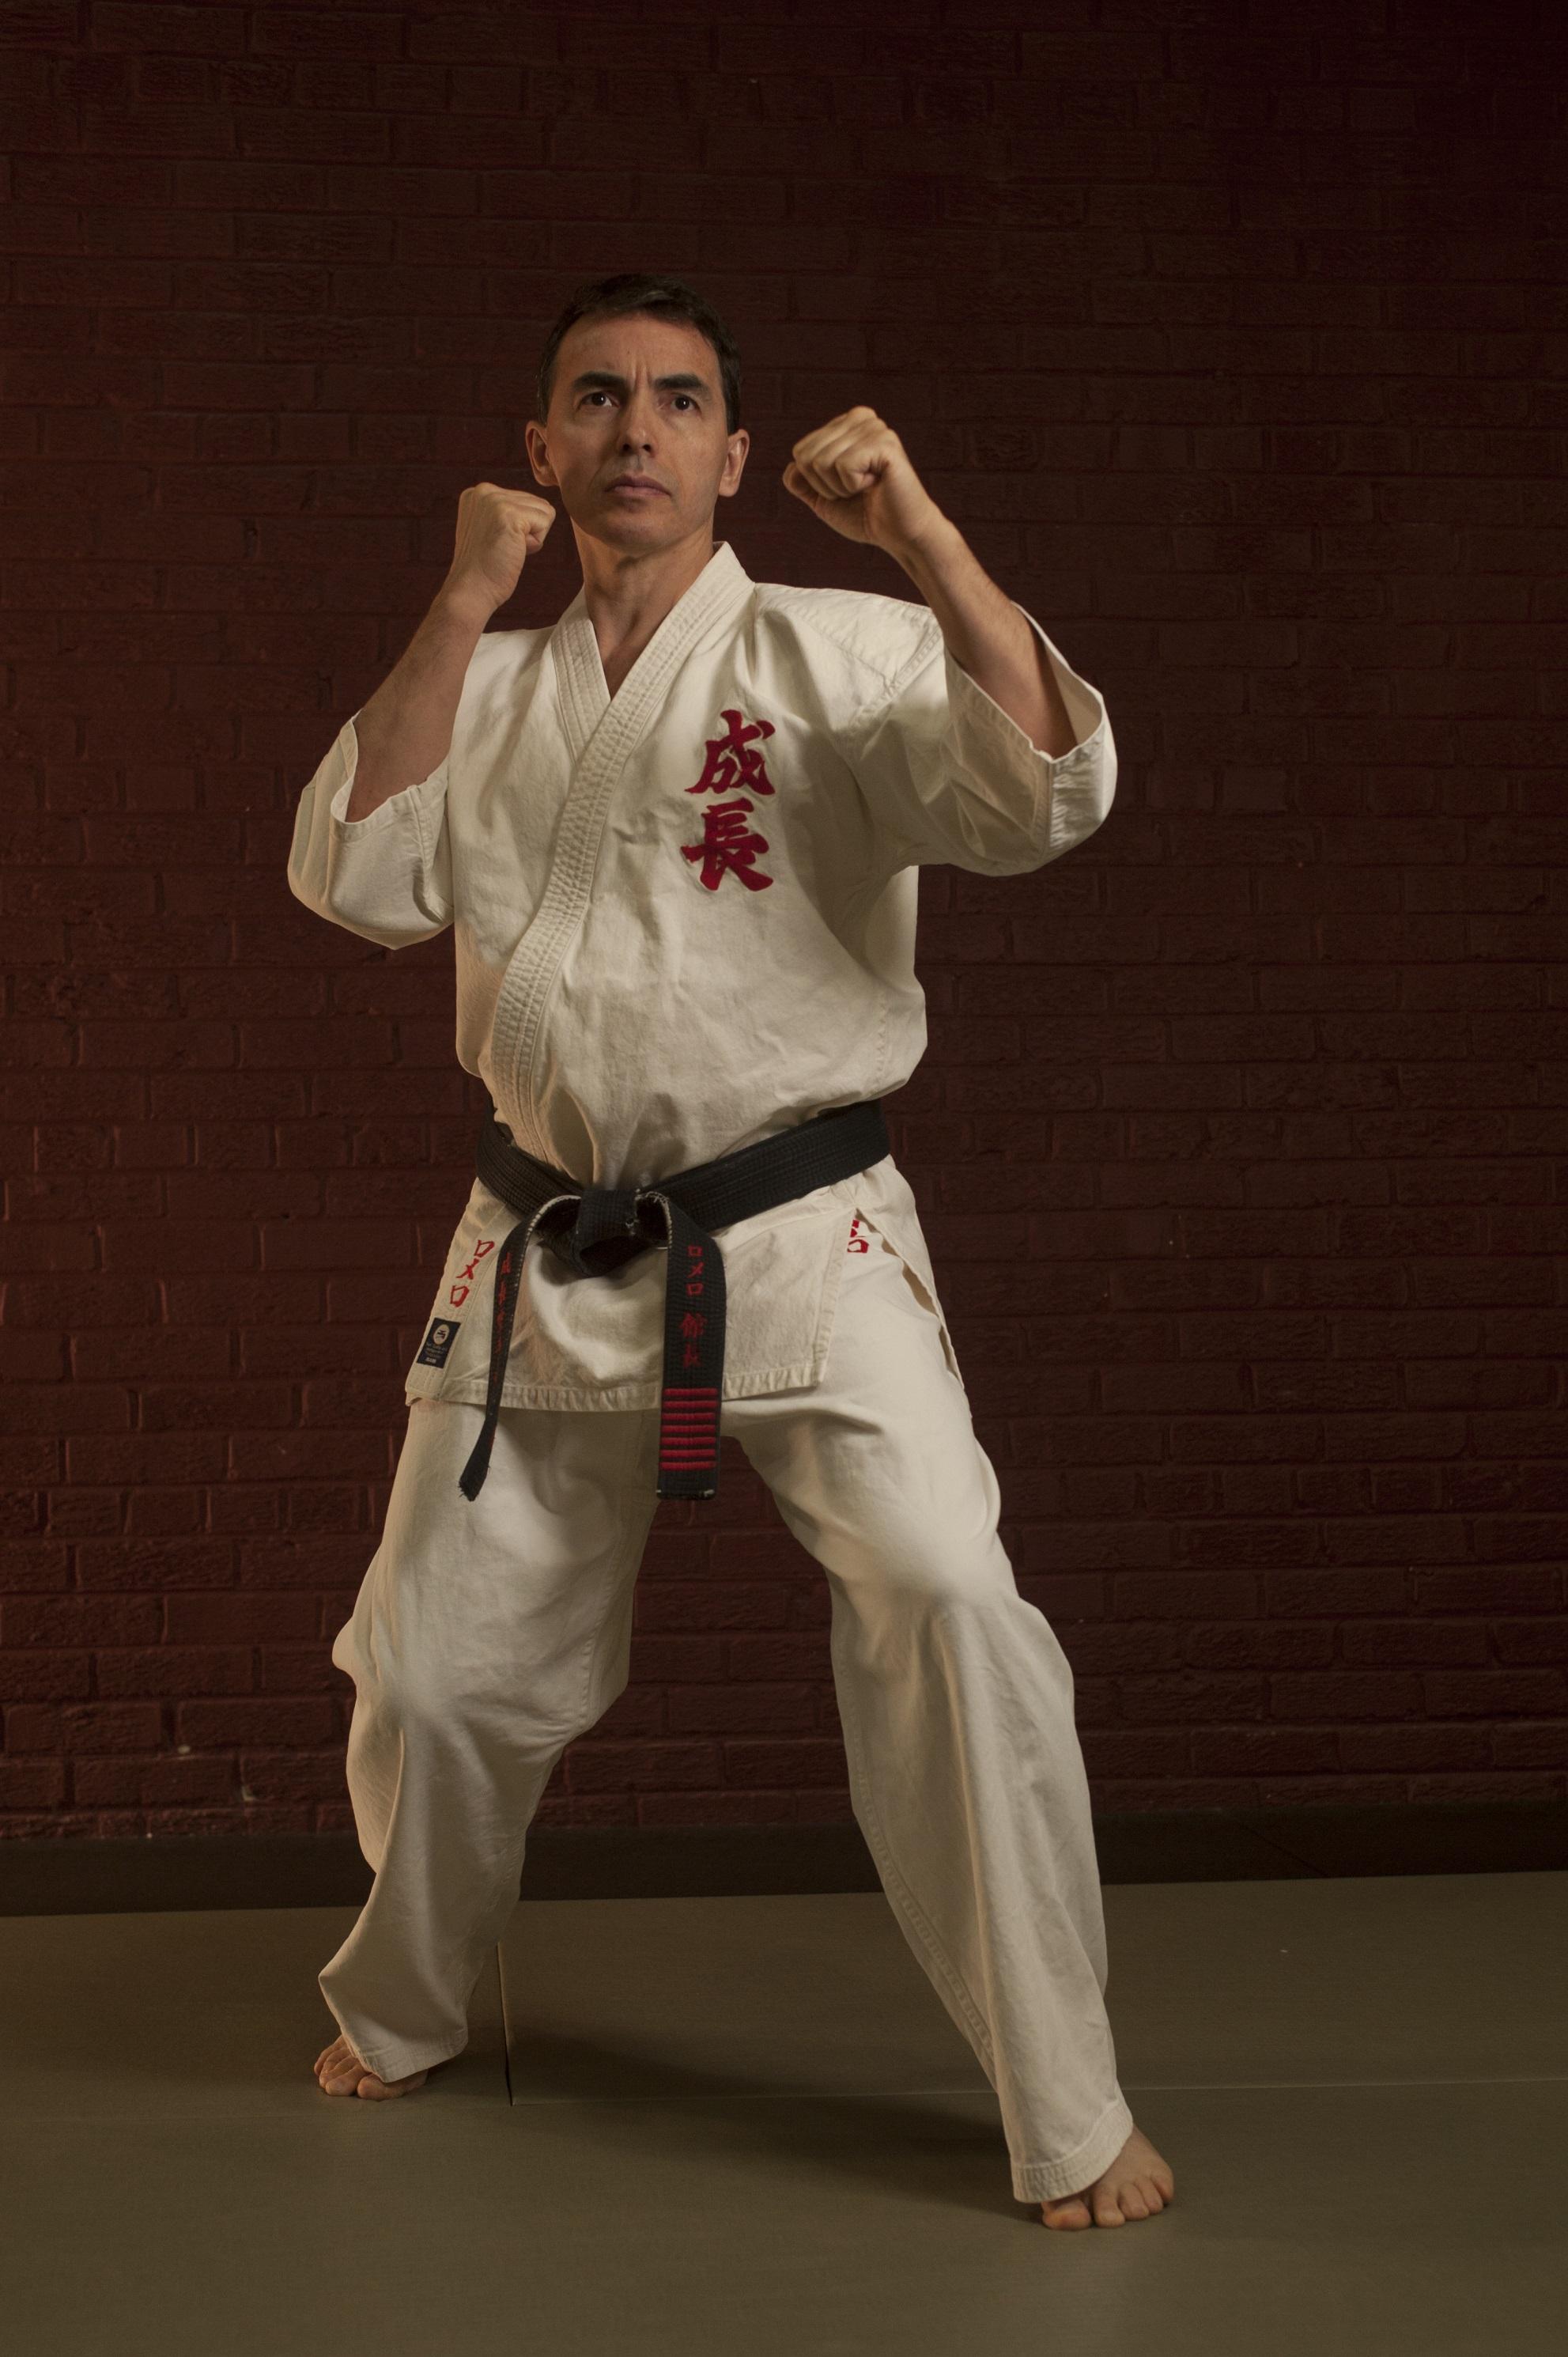 shihan fighting stance